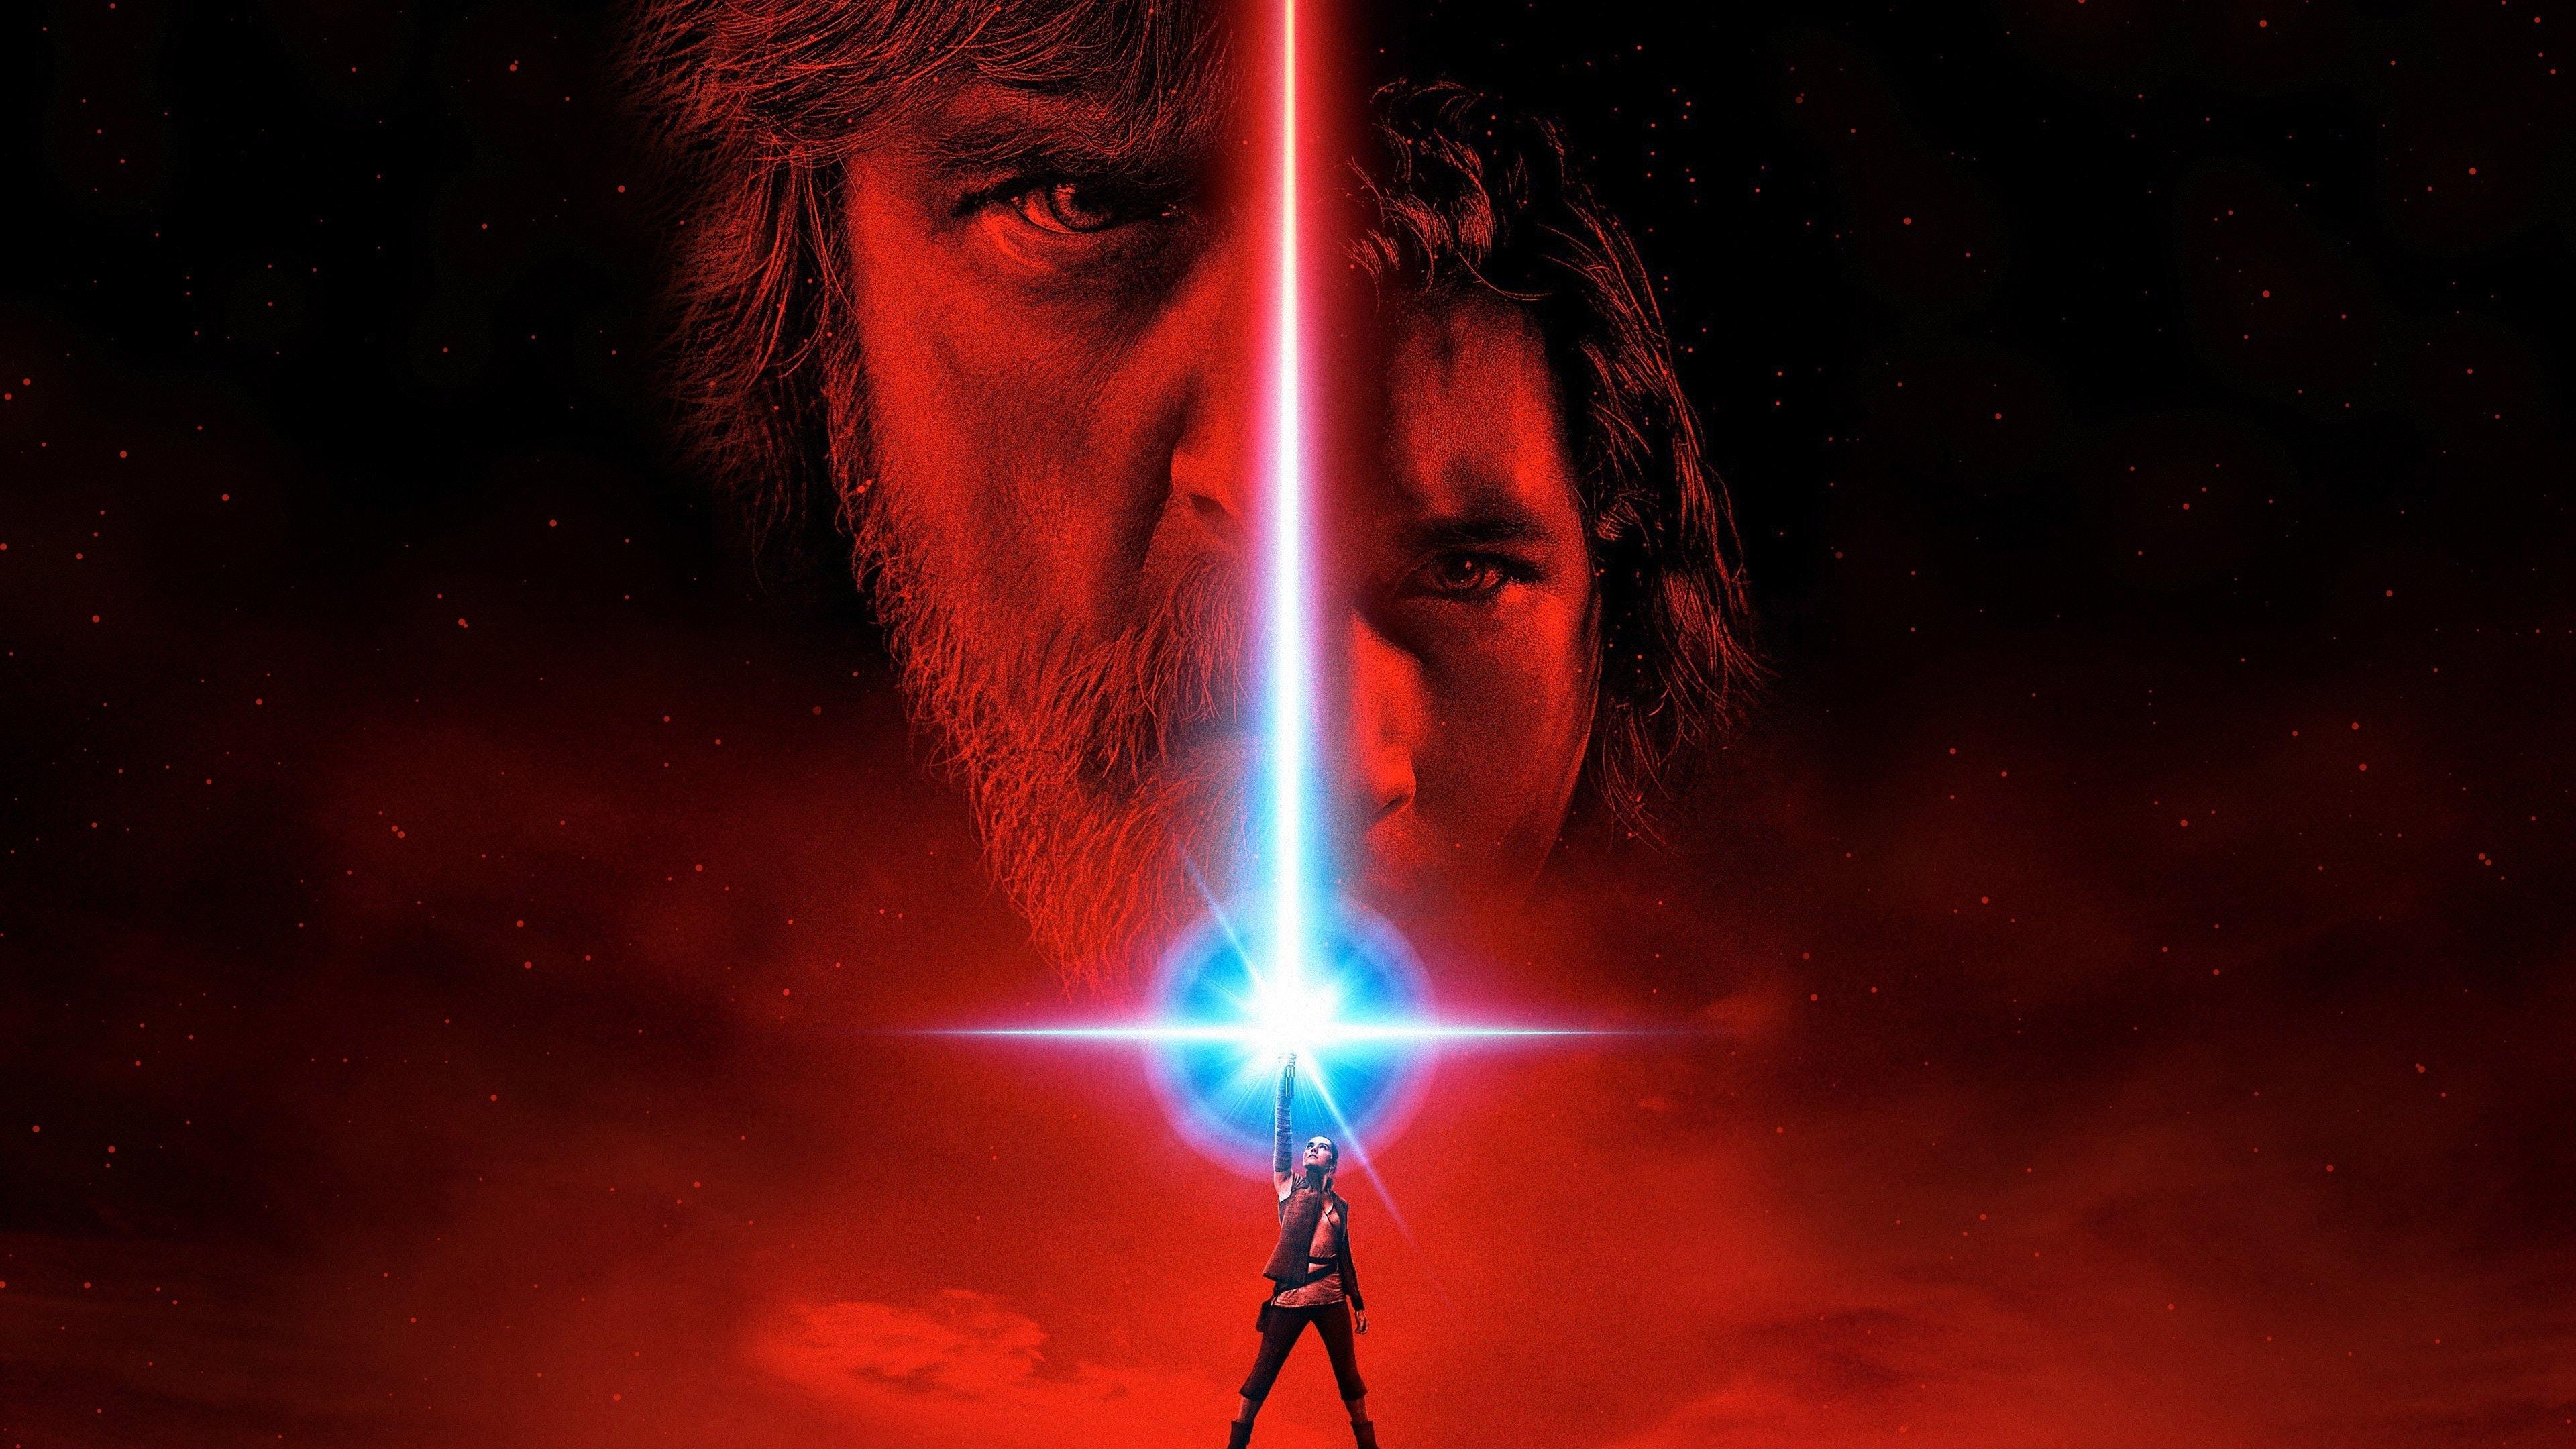 Star Wars: The Last Jedi Soundtrack